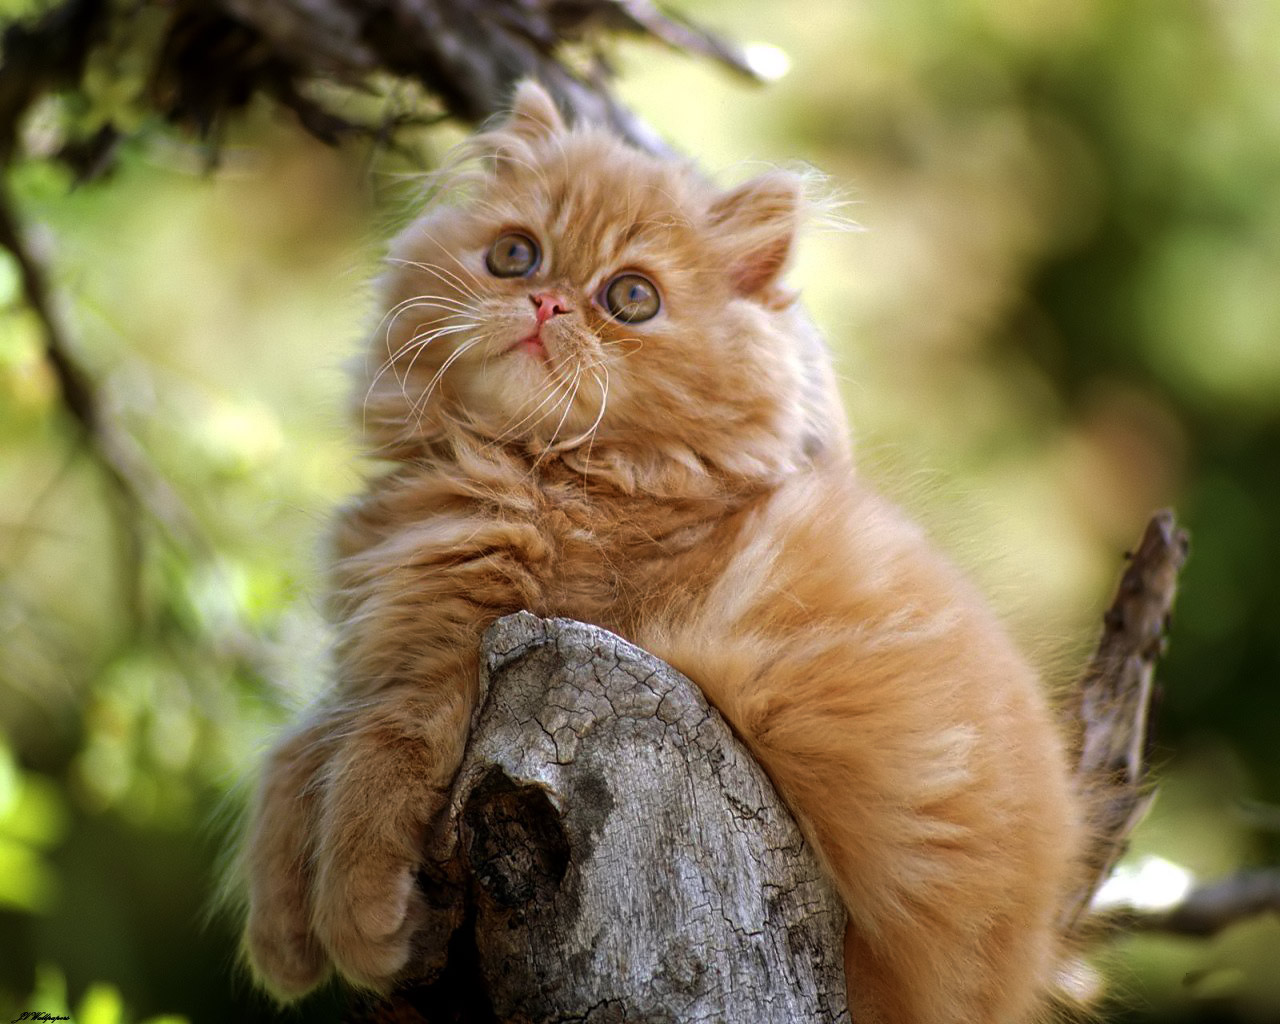 Persian Kitten - mèo hình nền (37009791) - fanpop